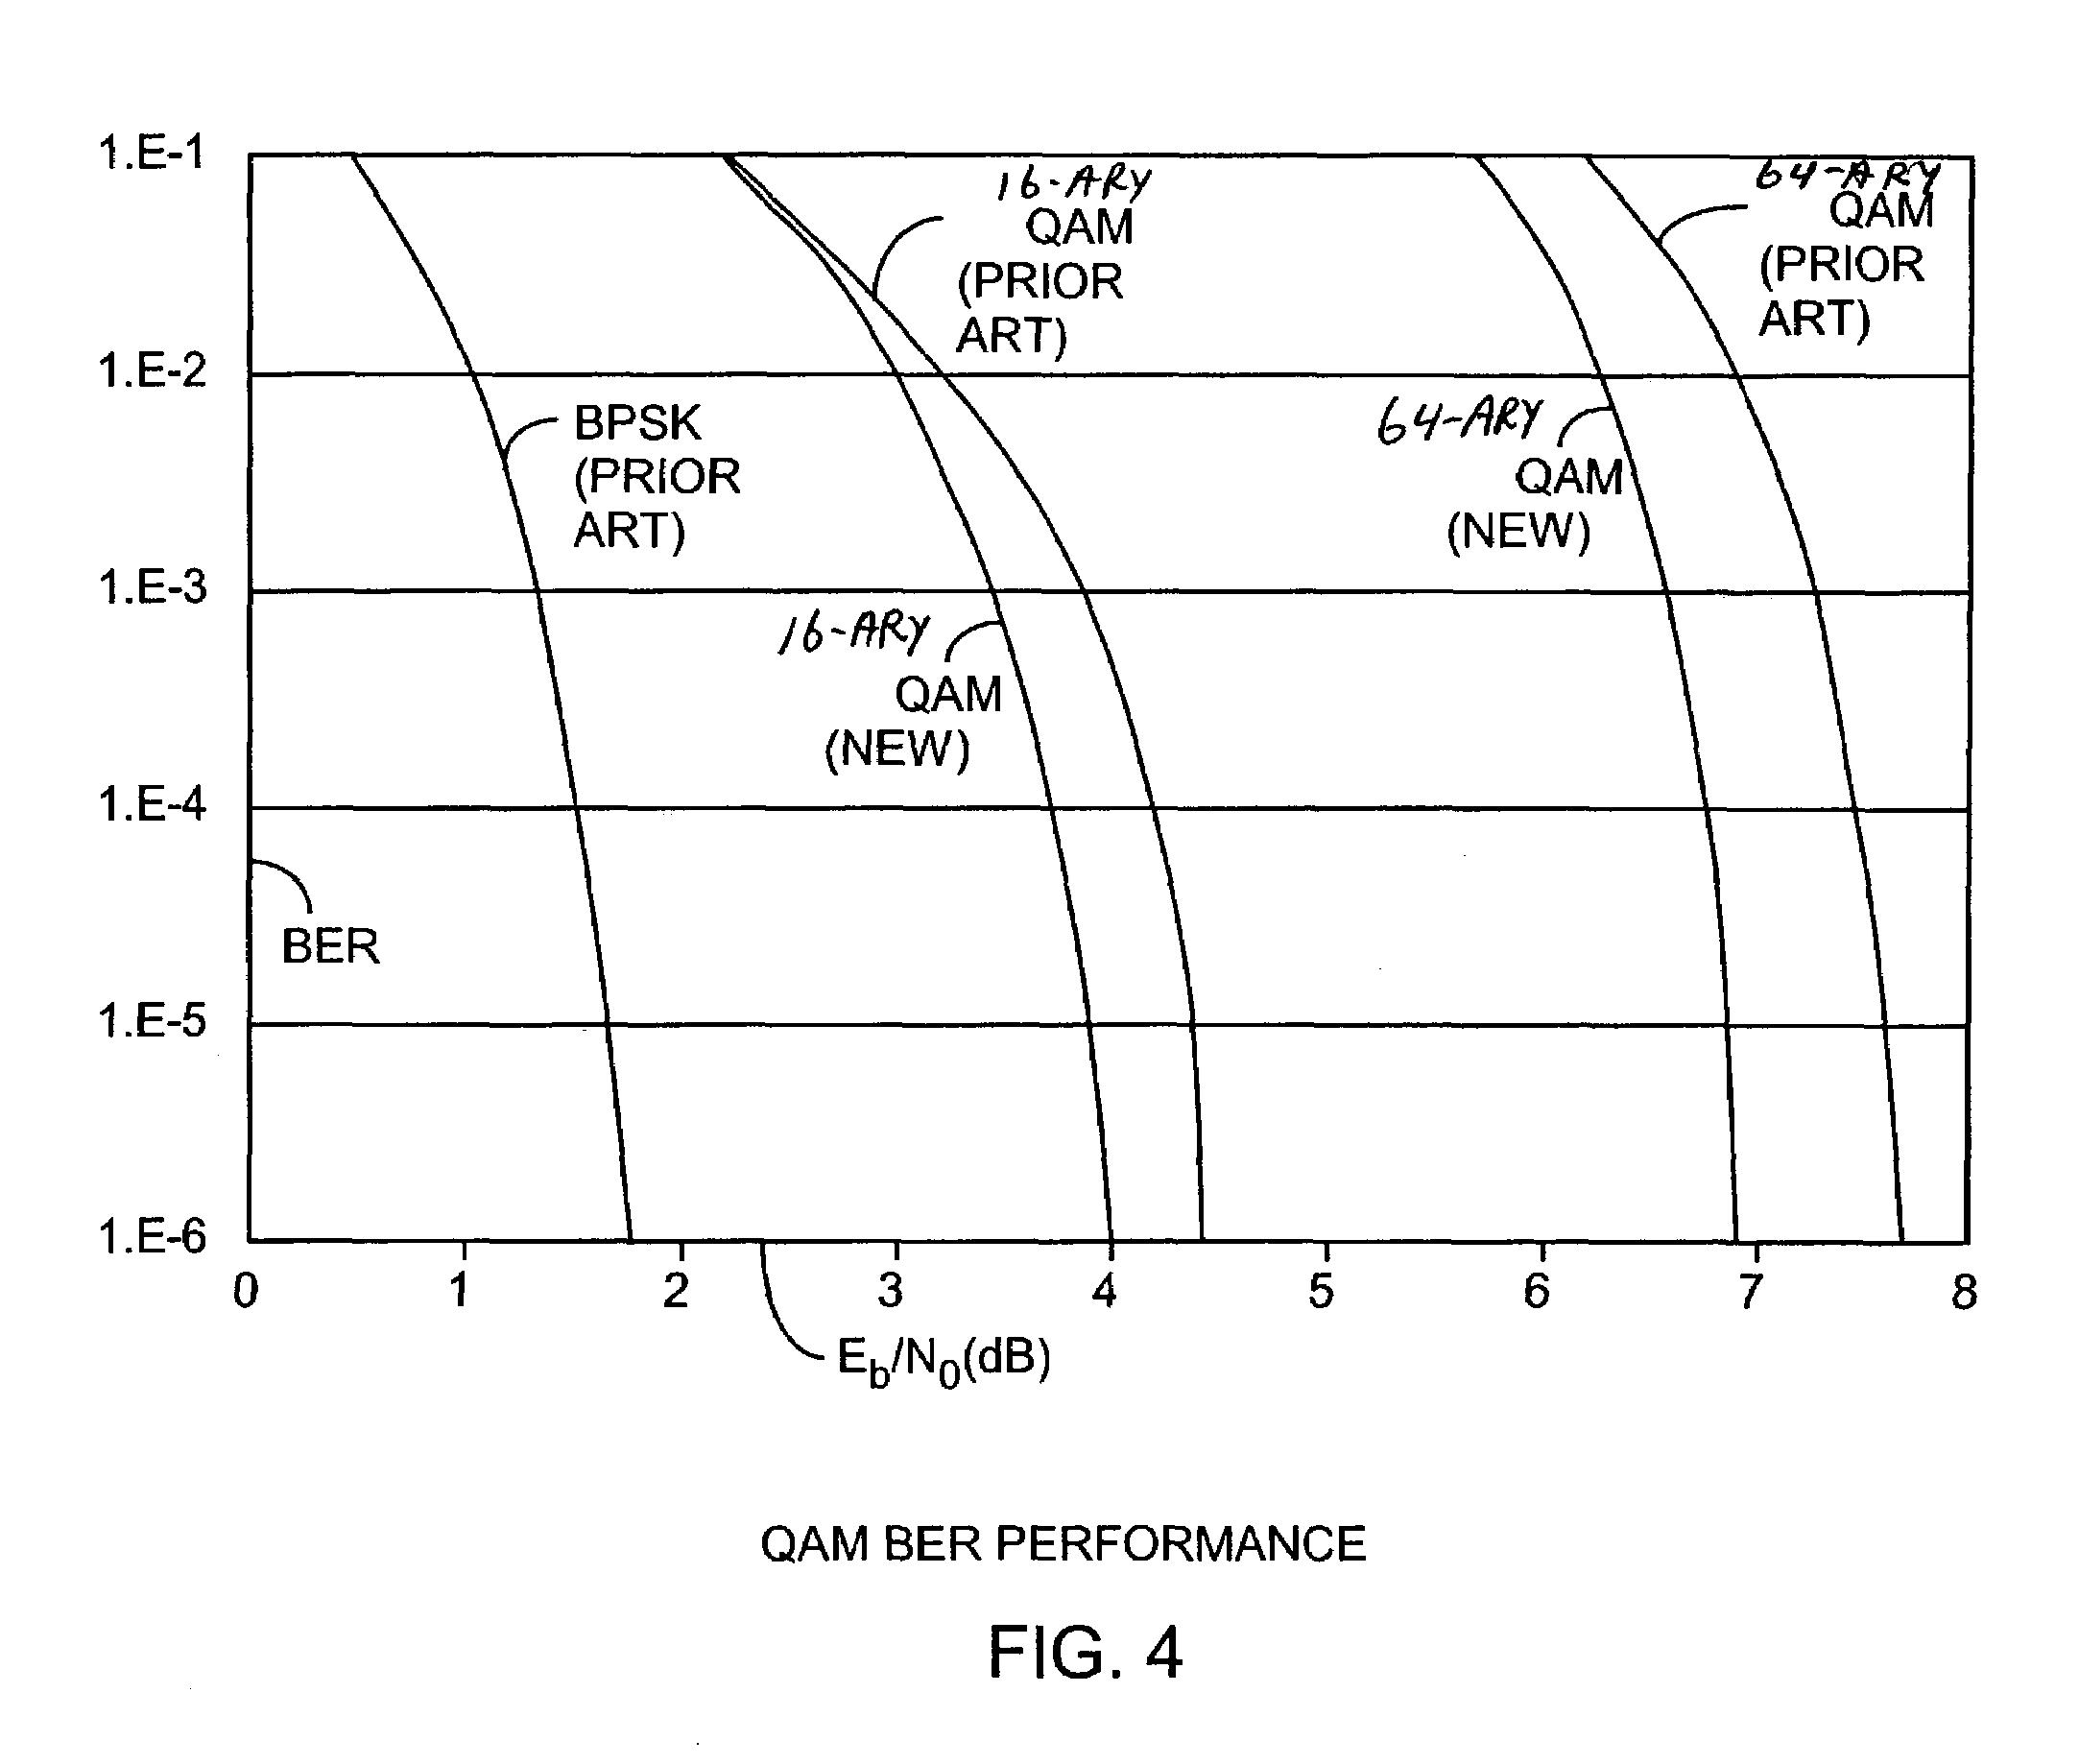 m ary psk transmitter block diagram wiring library AM Transmitter Block Diagram patent us7142611 m ary phase shift keying (psk) bit boundary turbo patent drawing m ary psk transmitter block diagram